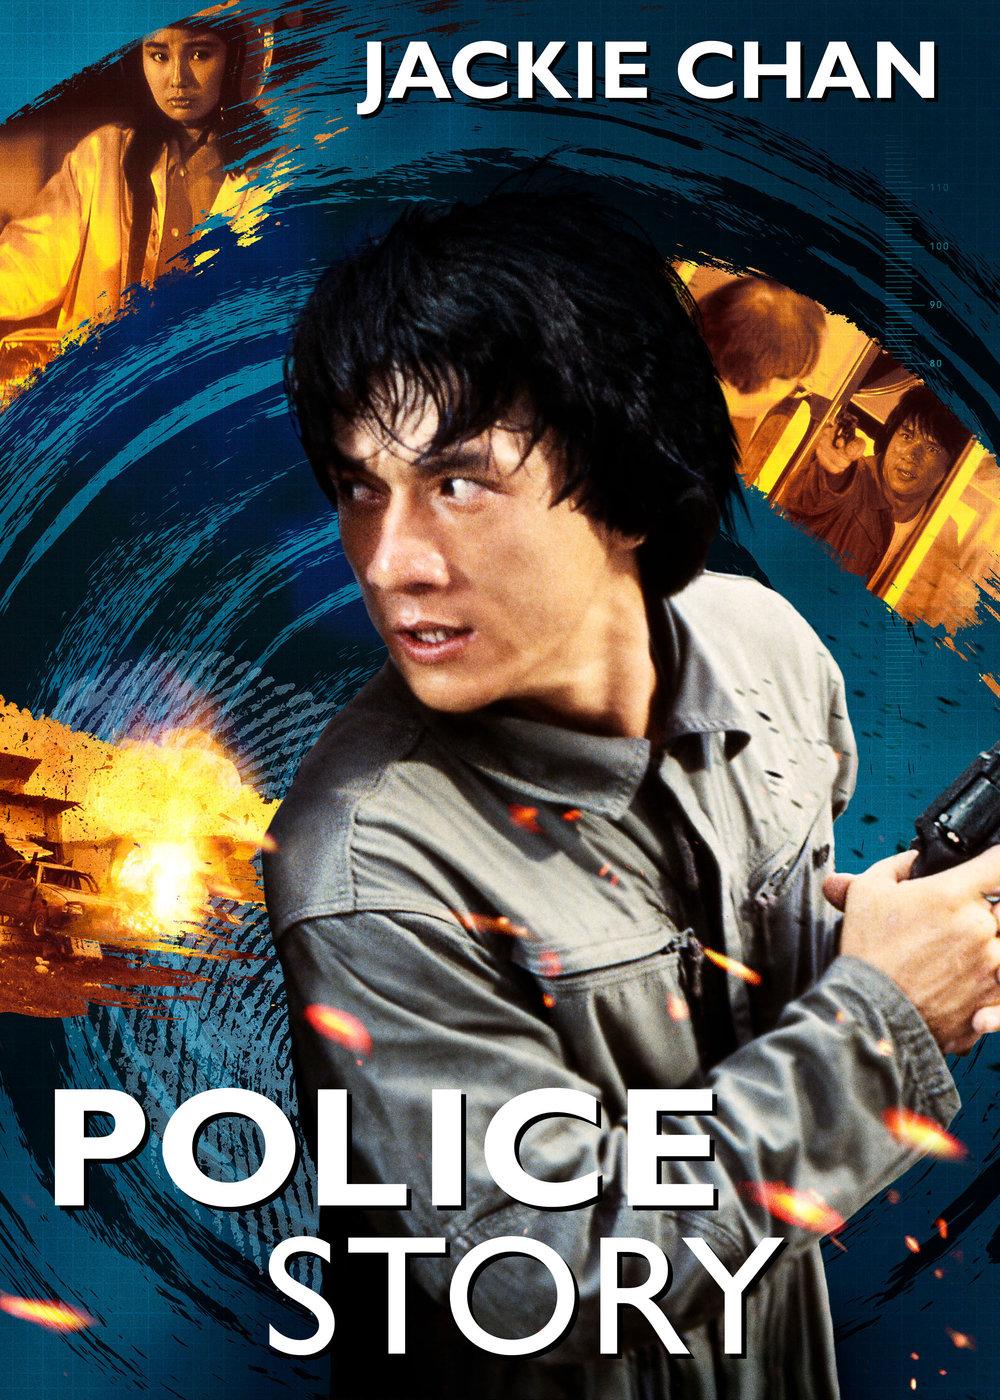 Police-Story-poster.jpg